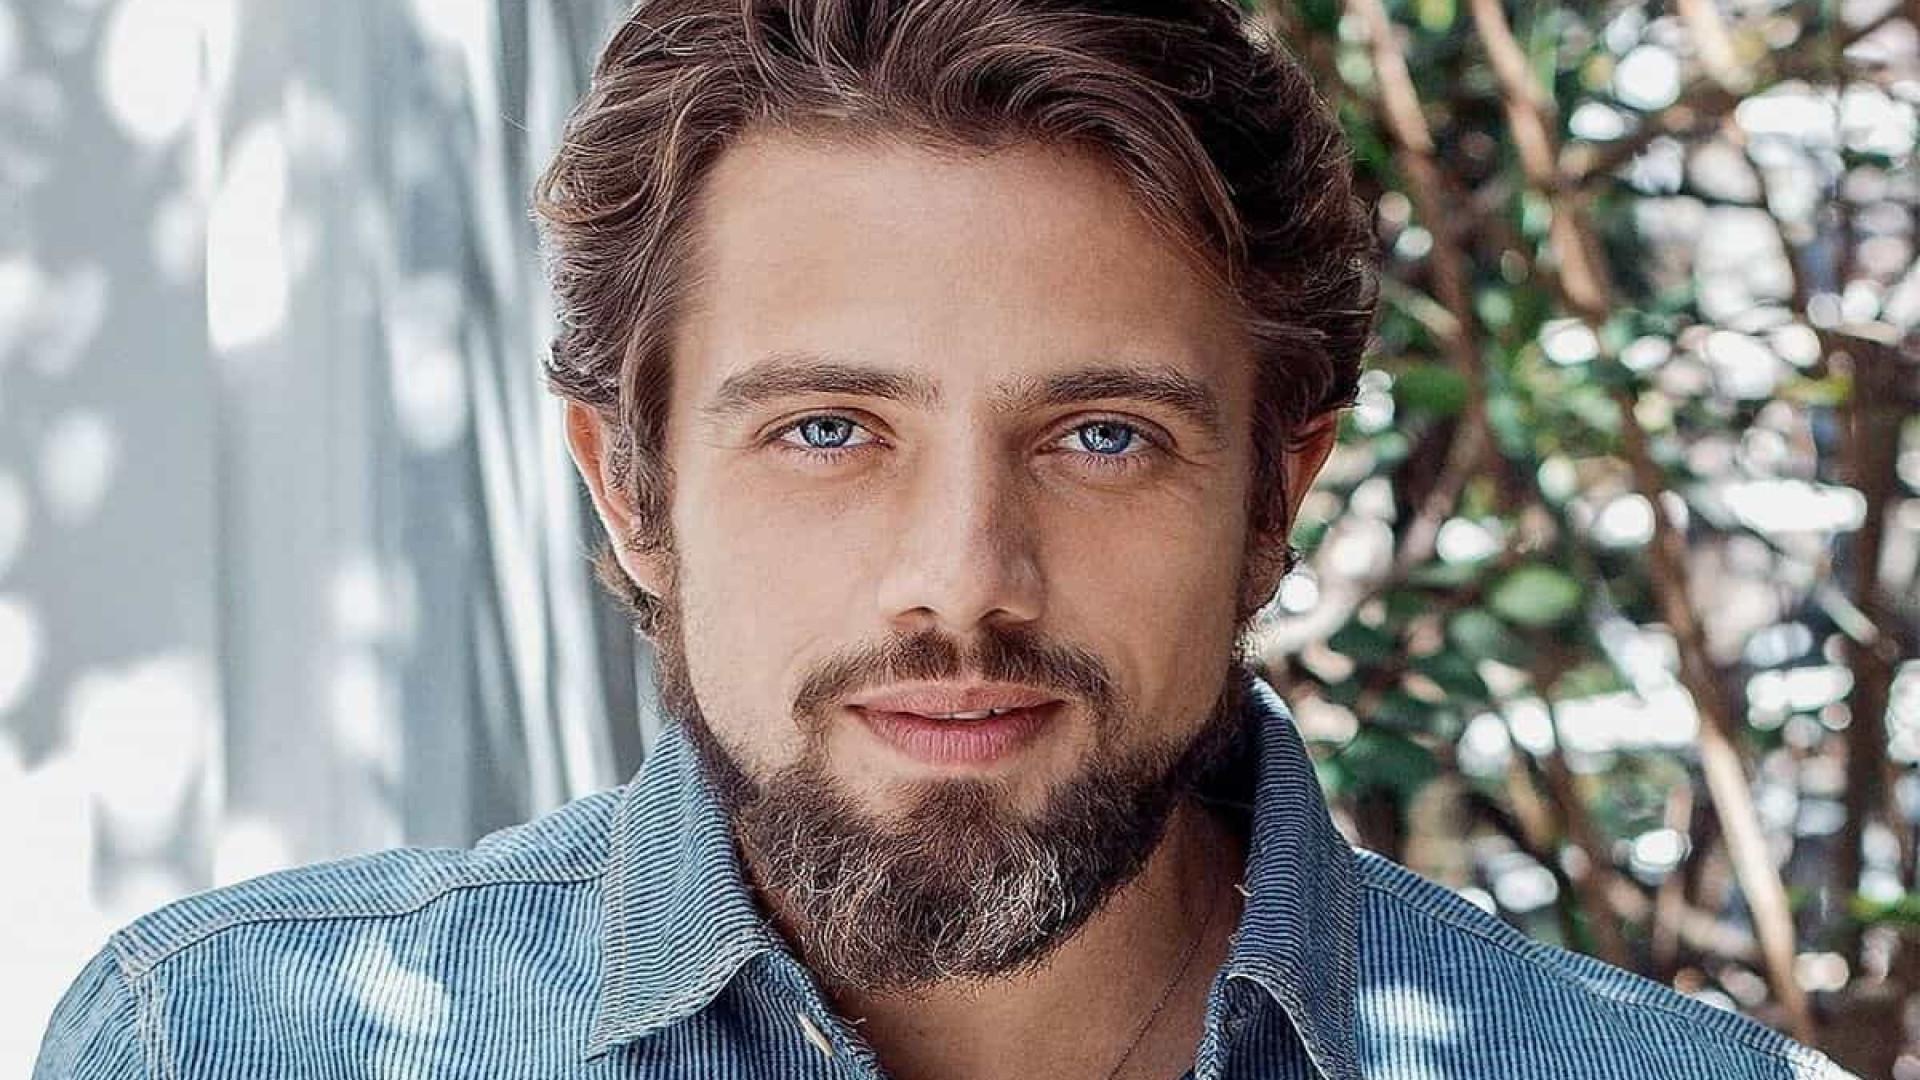 Vizinho de Paulo Betti, Rafael Cardoso joga encomendas ao ator pelo muro